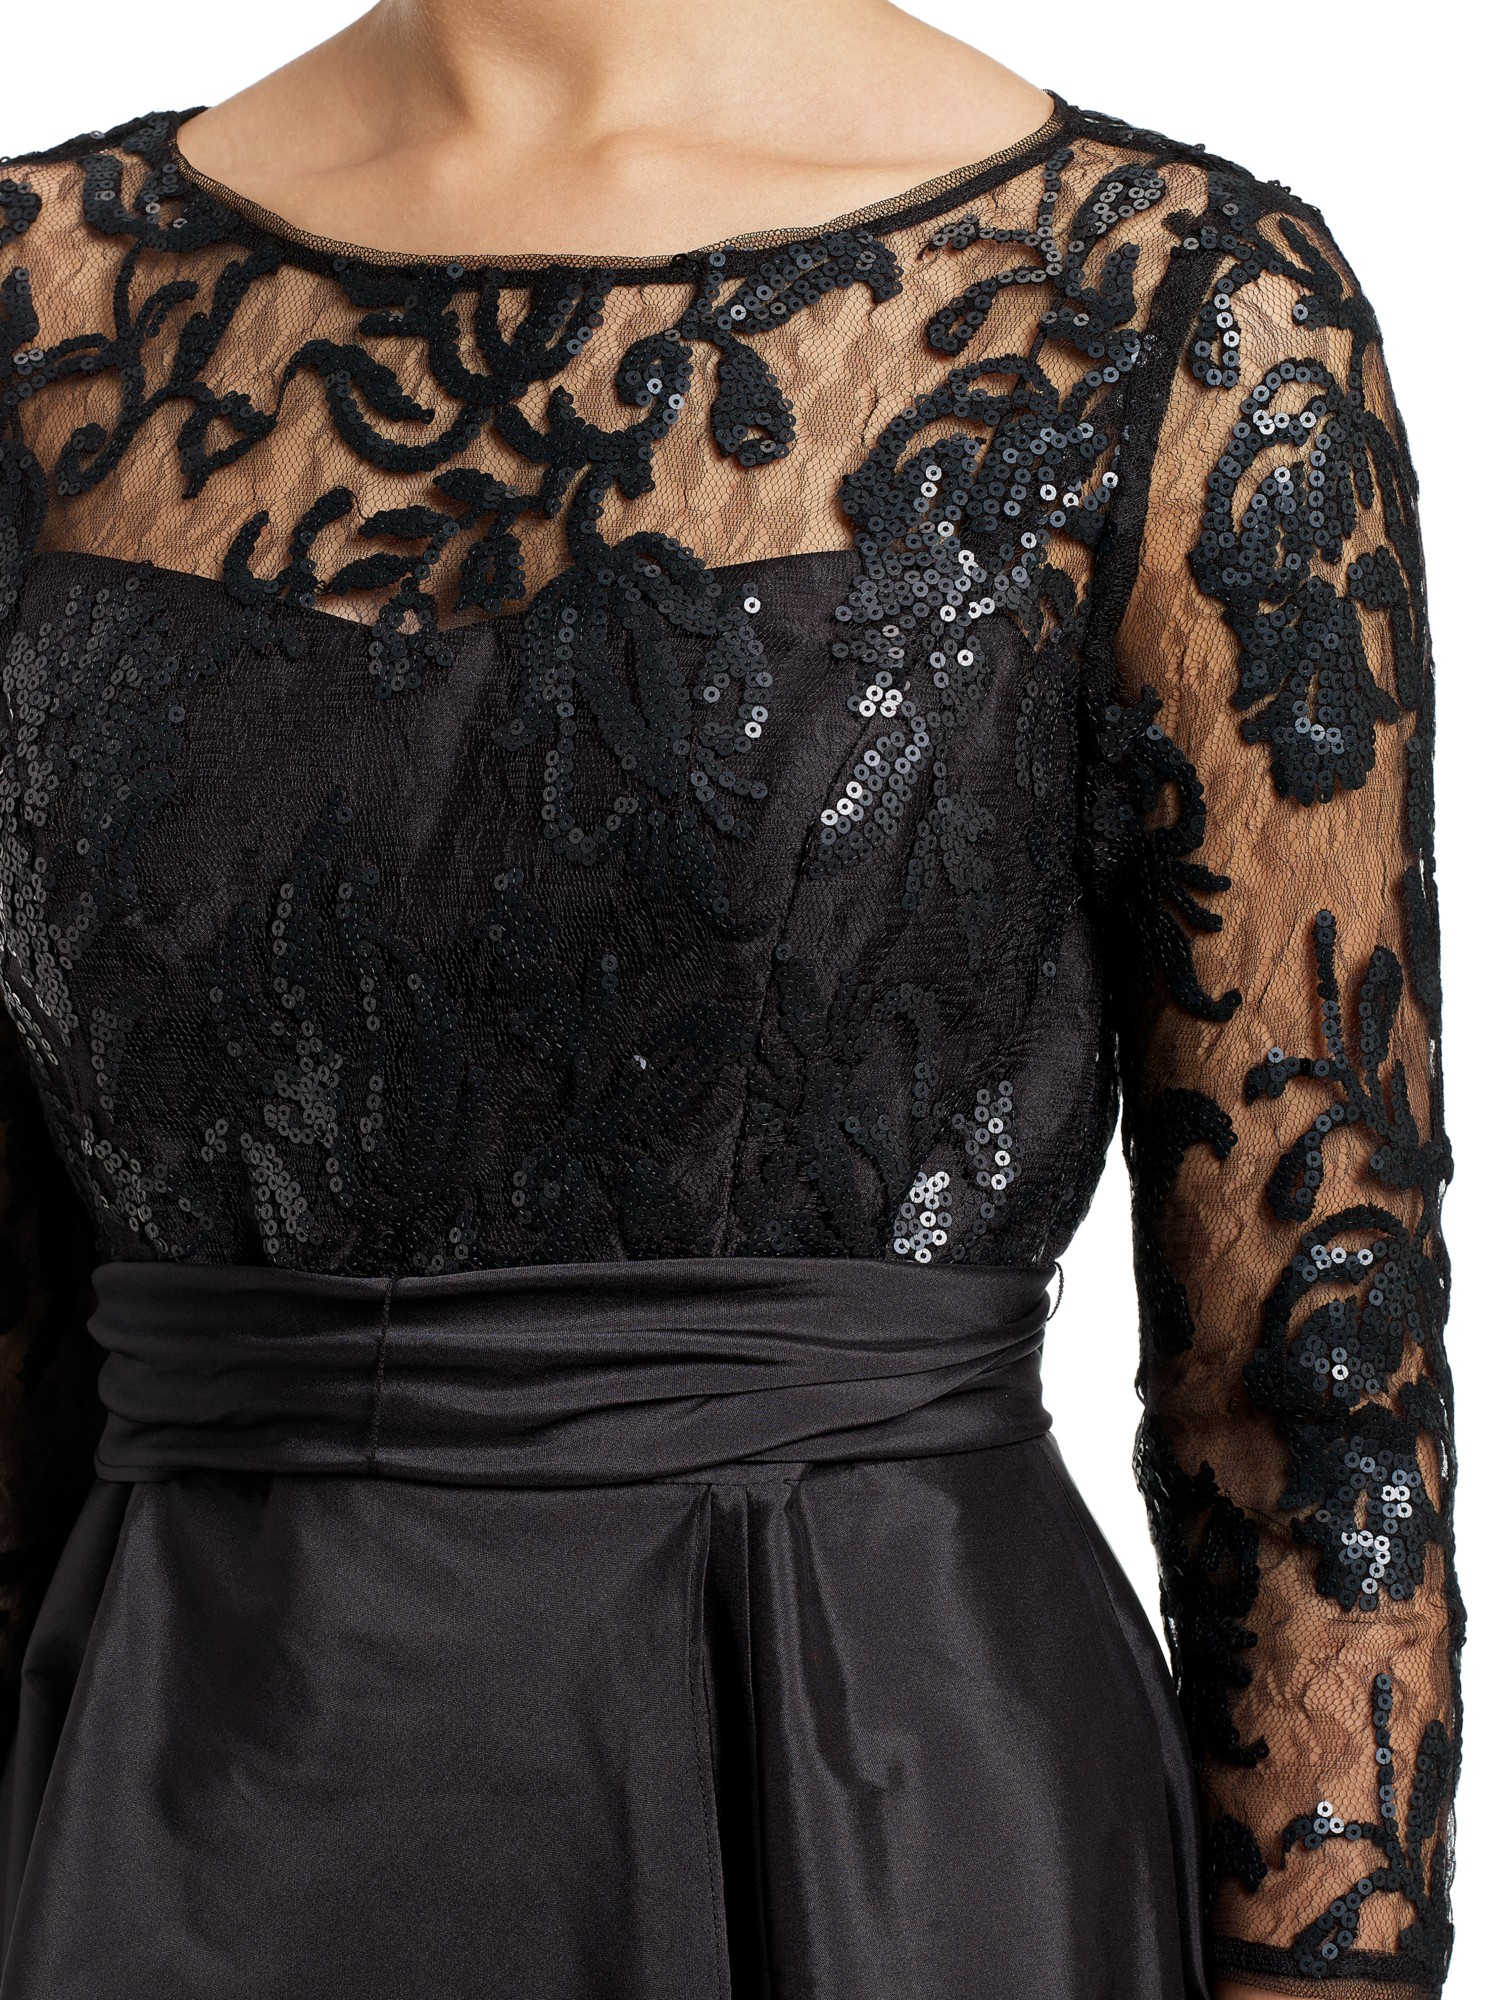 b7b699f8503a3c Adrianna Papell Sequin Illusion Taffeta Gown in Black - Lyst